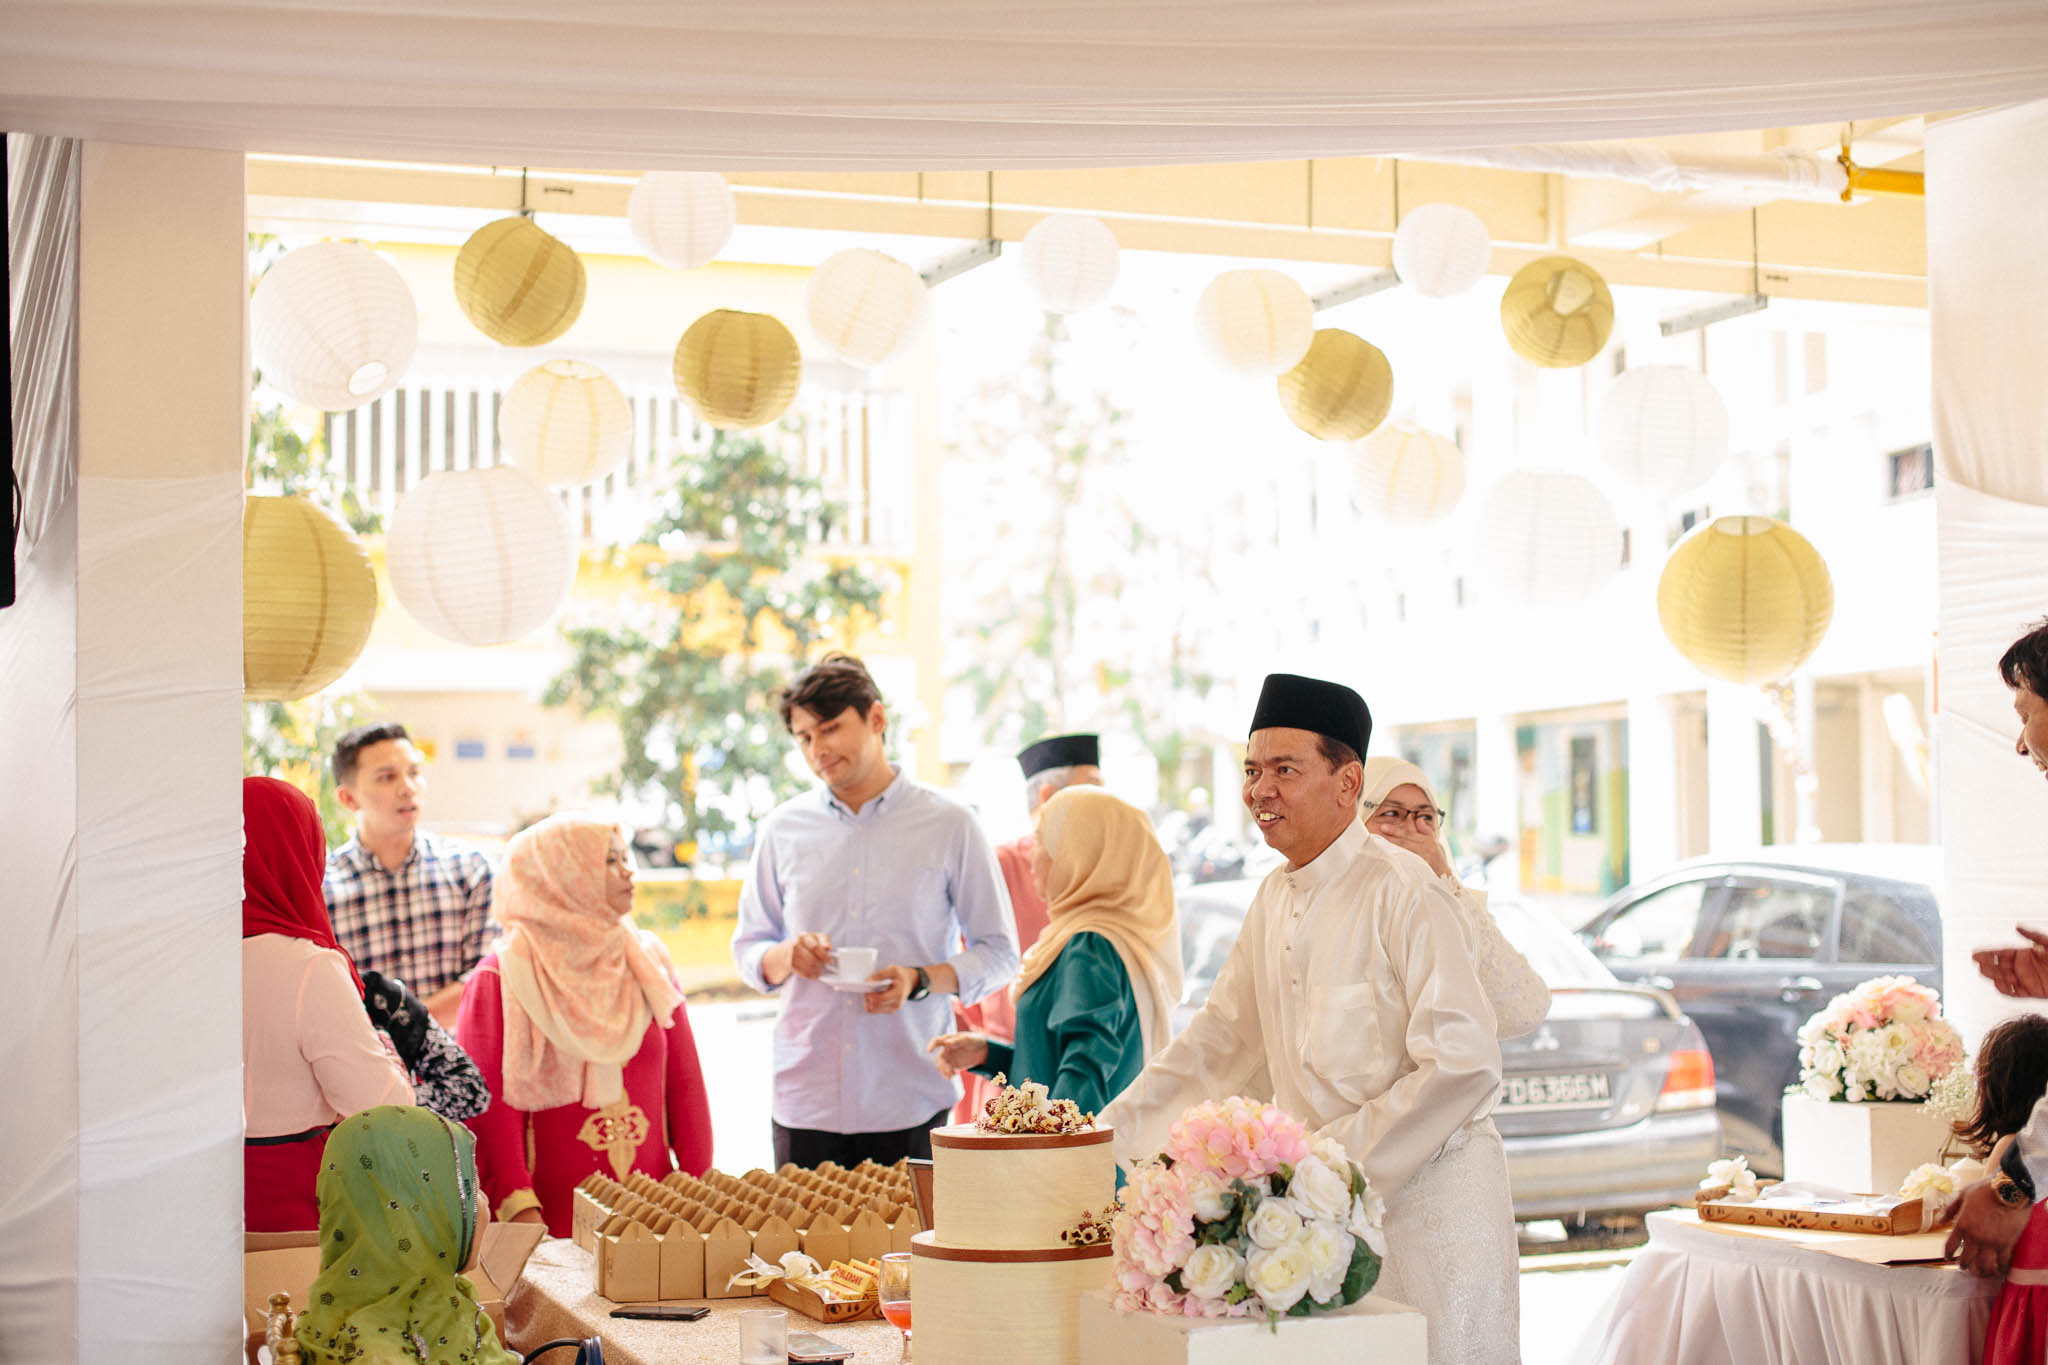 singapore-wedding-photographer-sharalyn-syazwan-024.jpg